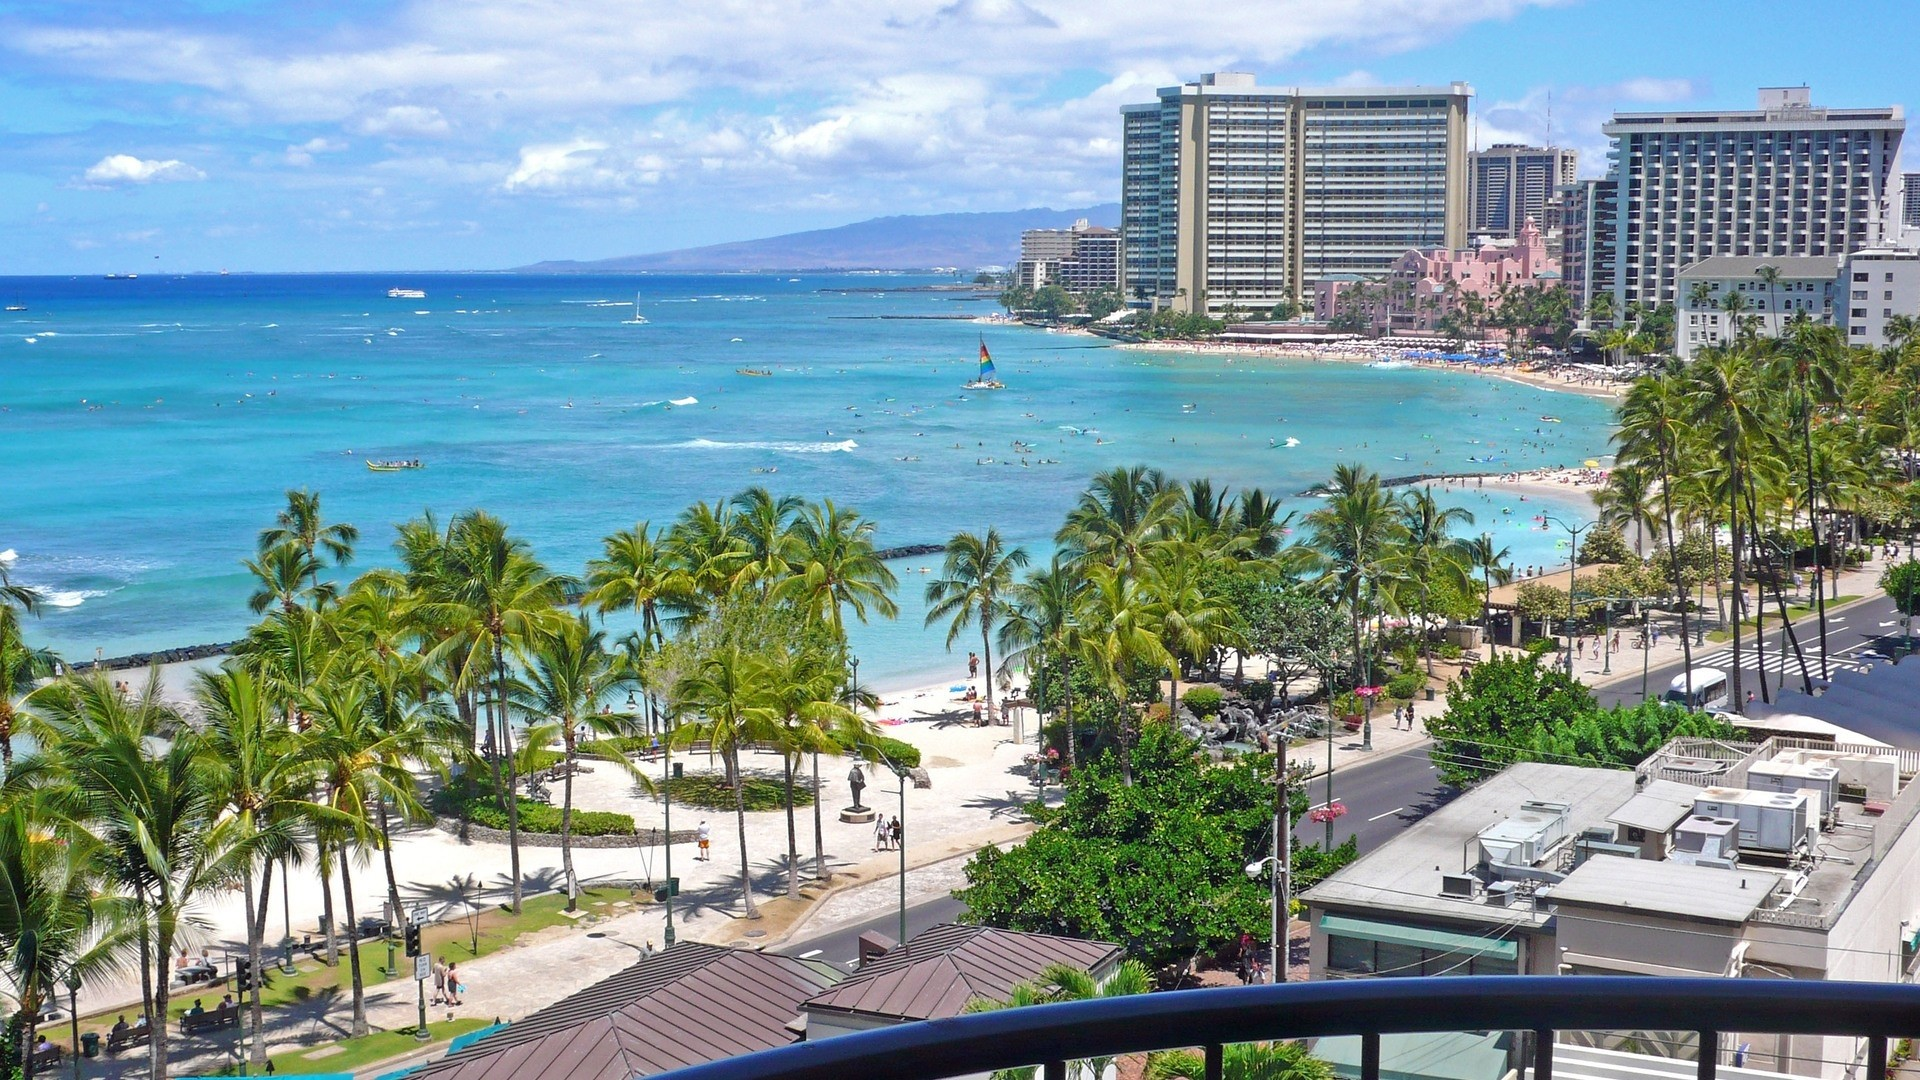 Wallpaper honolulu hawaii beach, united states, palm trees,  ocean, sea,